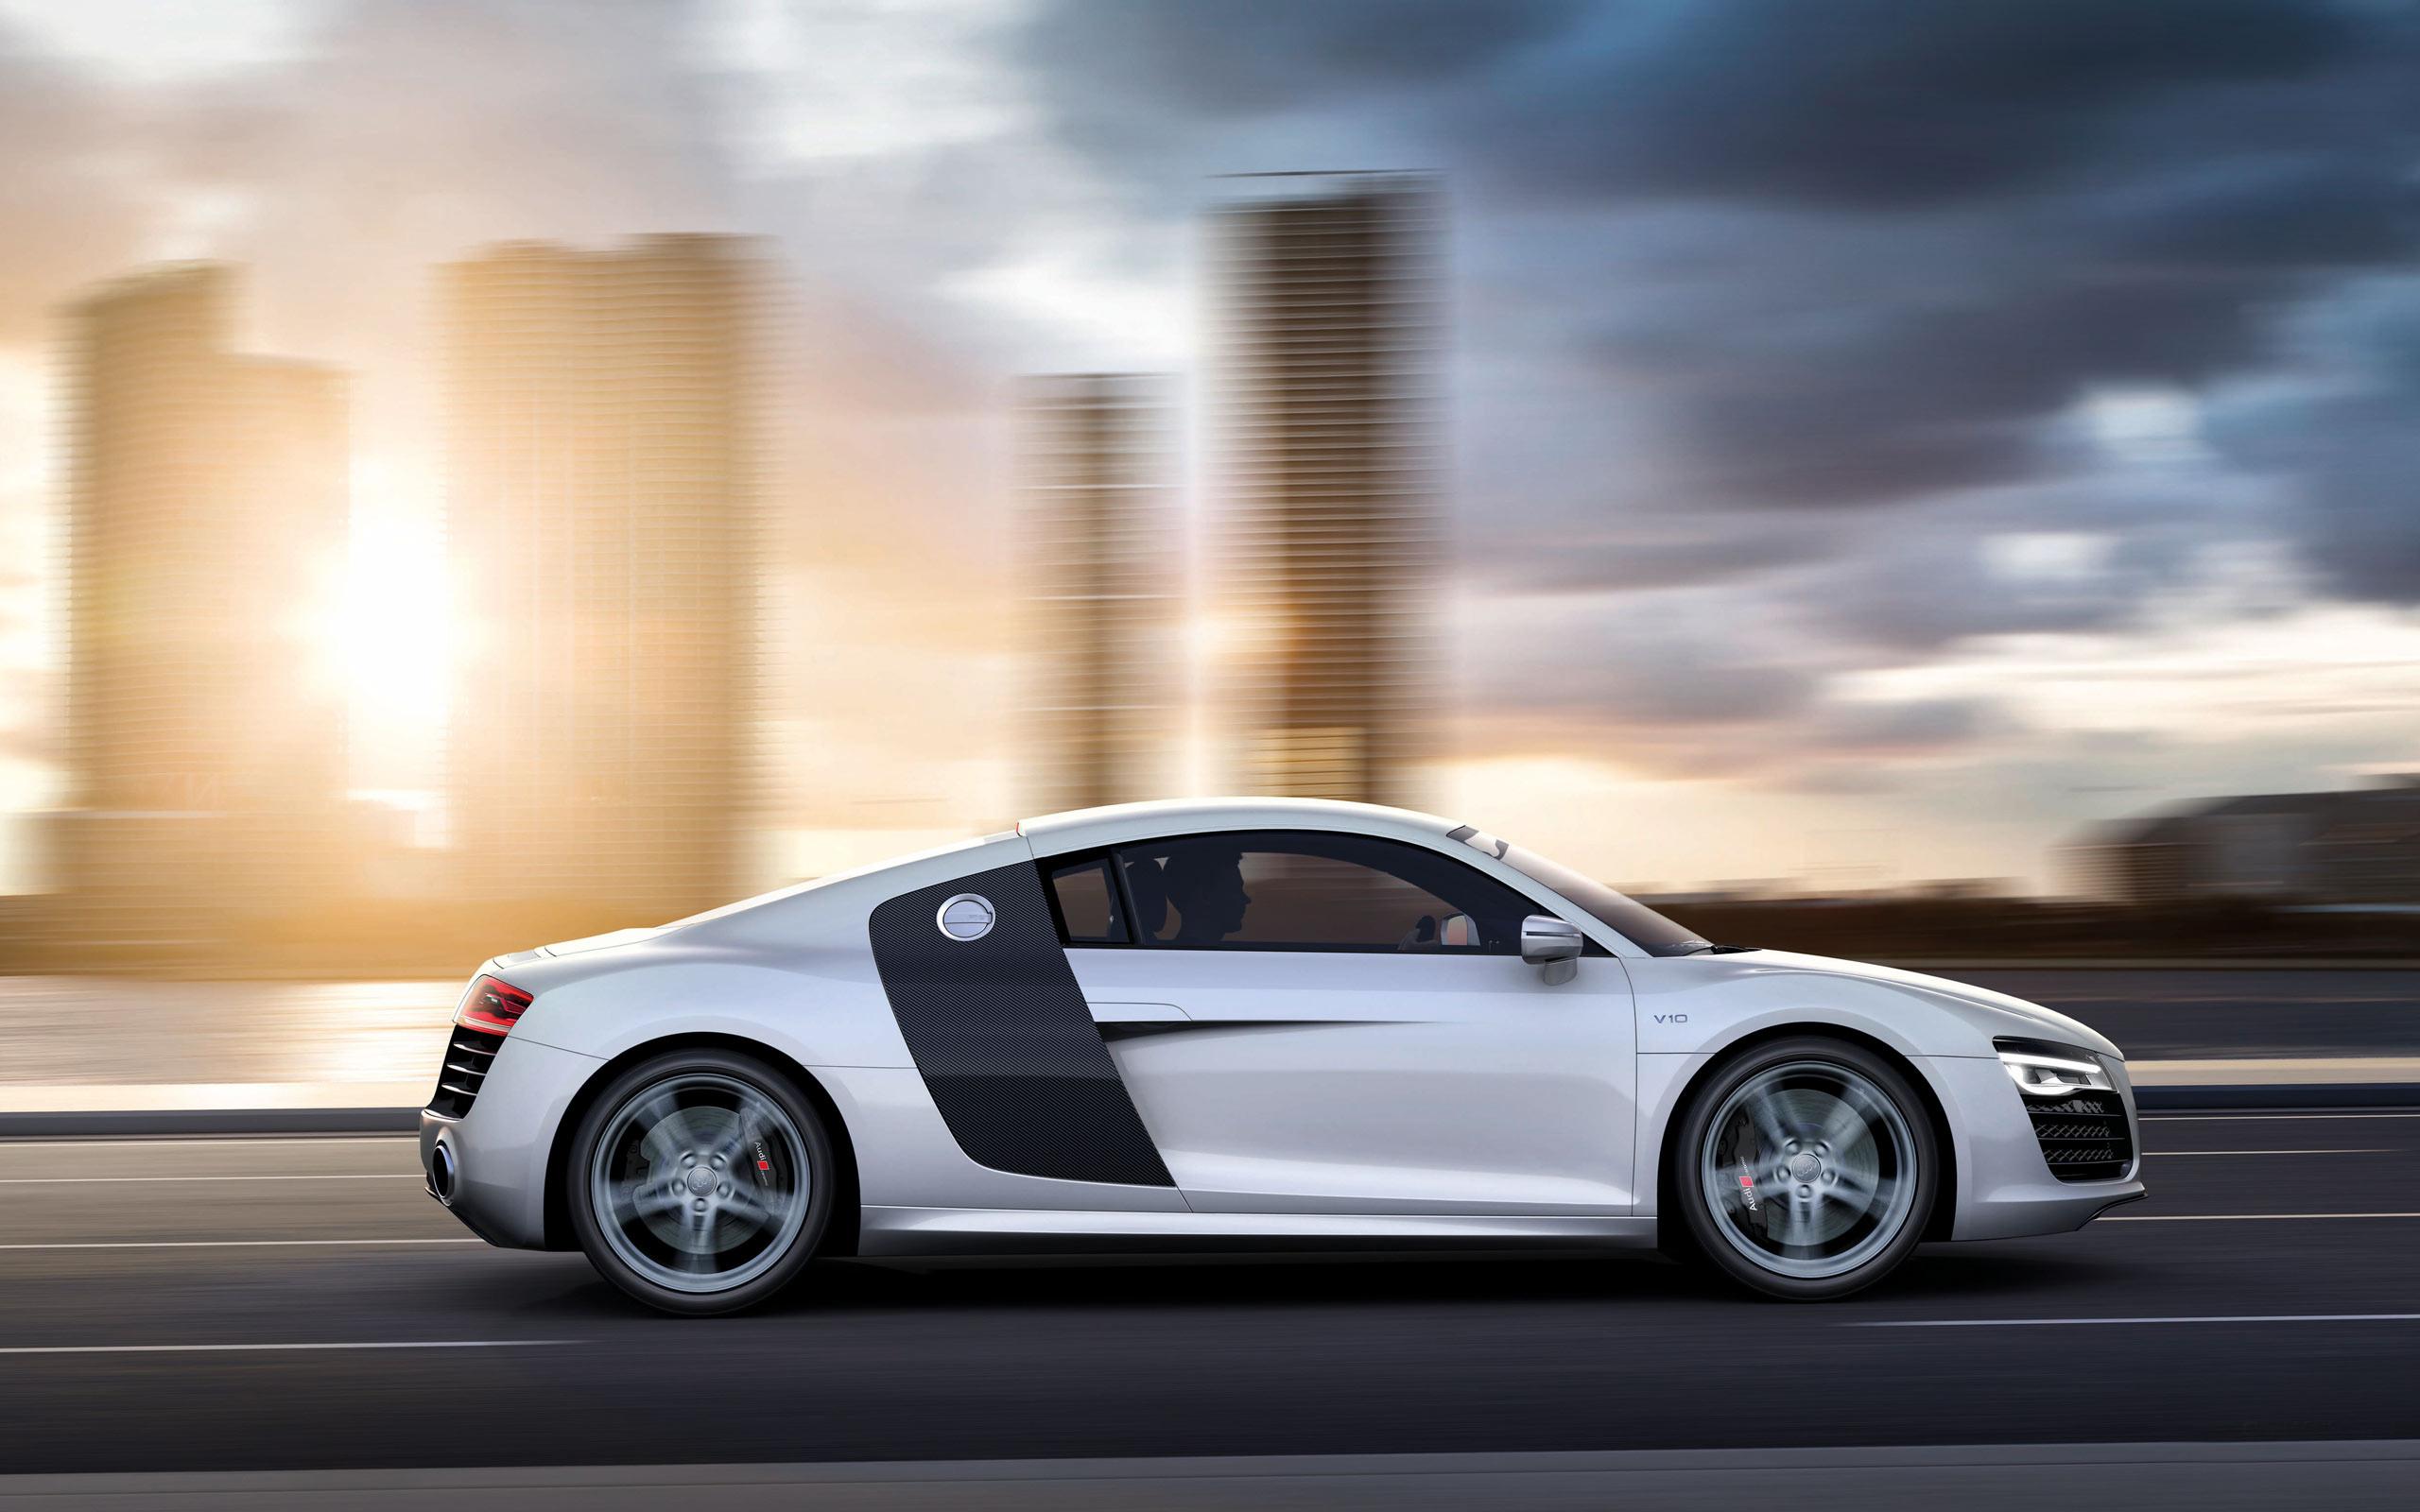 2013 Audi R8 6 Wallpaper Hd Car Wallpapers Id 2933